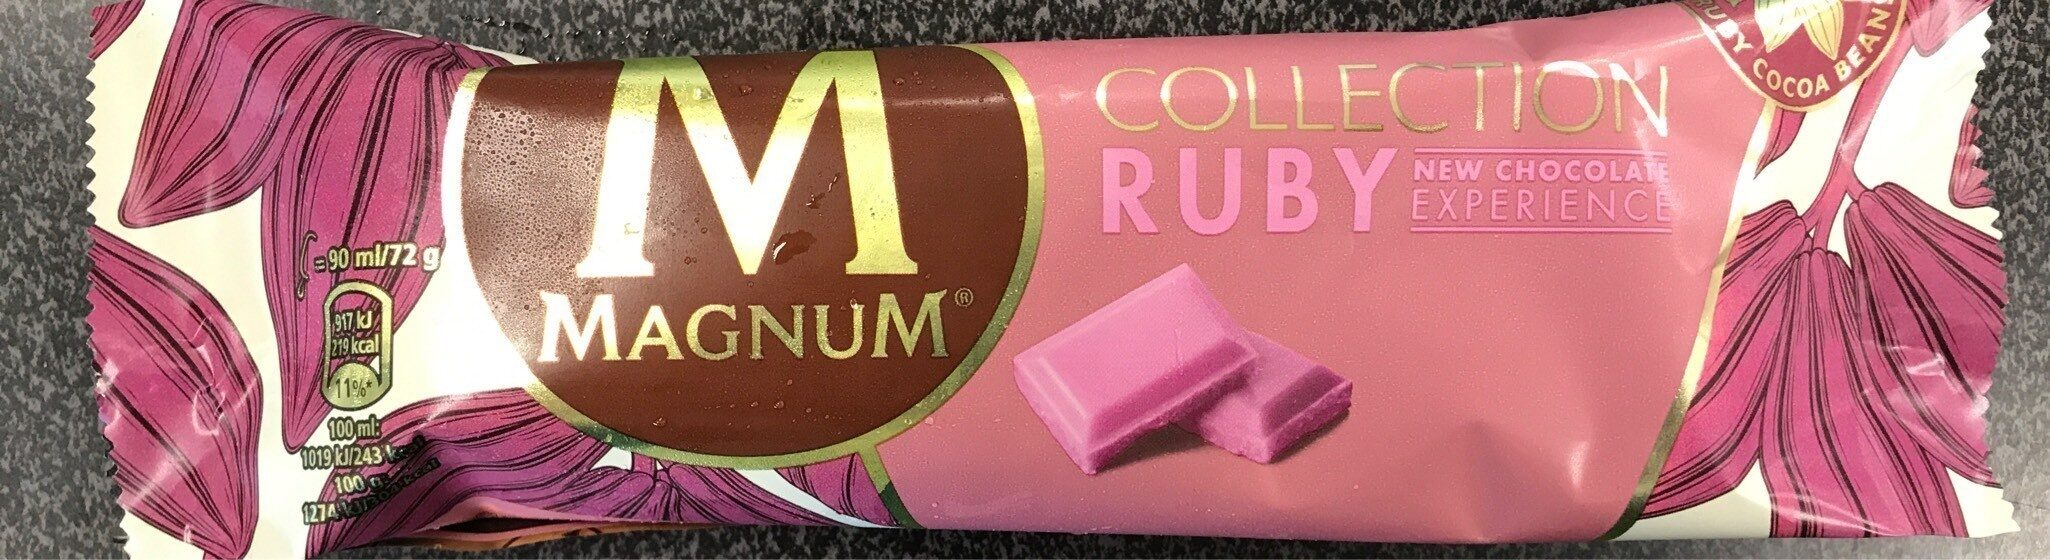 Magnum Ruby - Product - en